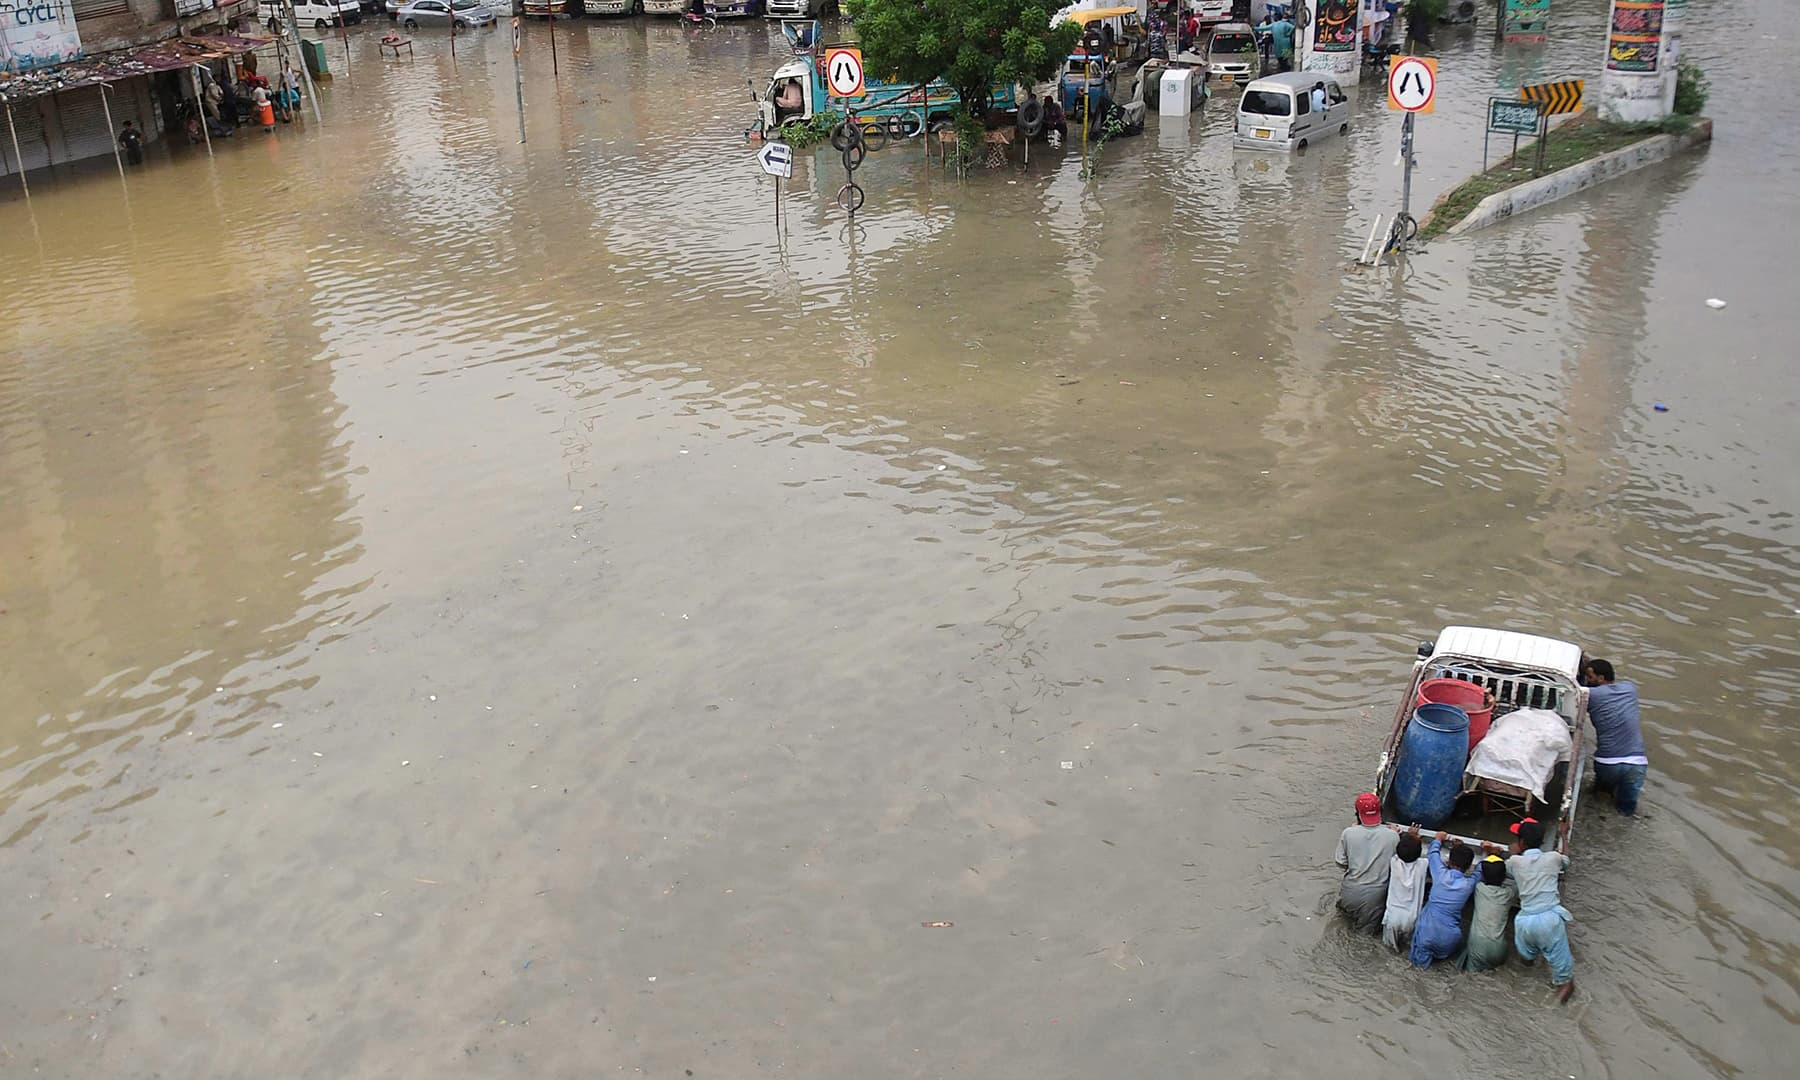 Men push a vehicle through a flooded street after heavy rainfall in Karachi on September 23. — AFP